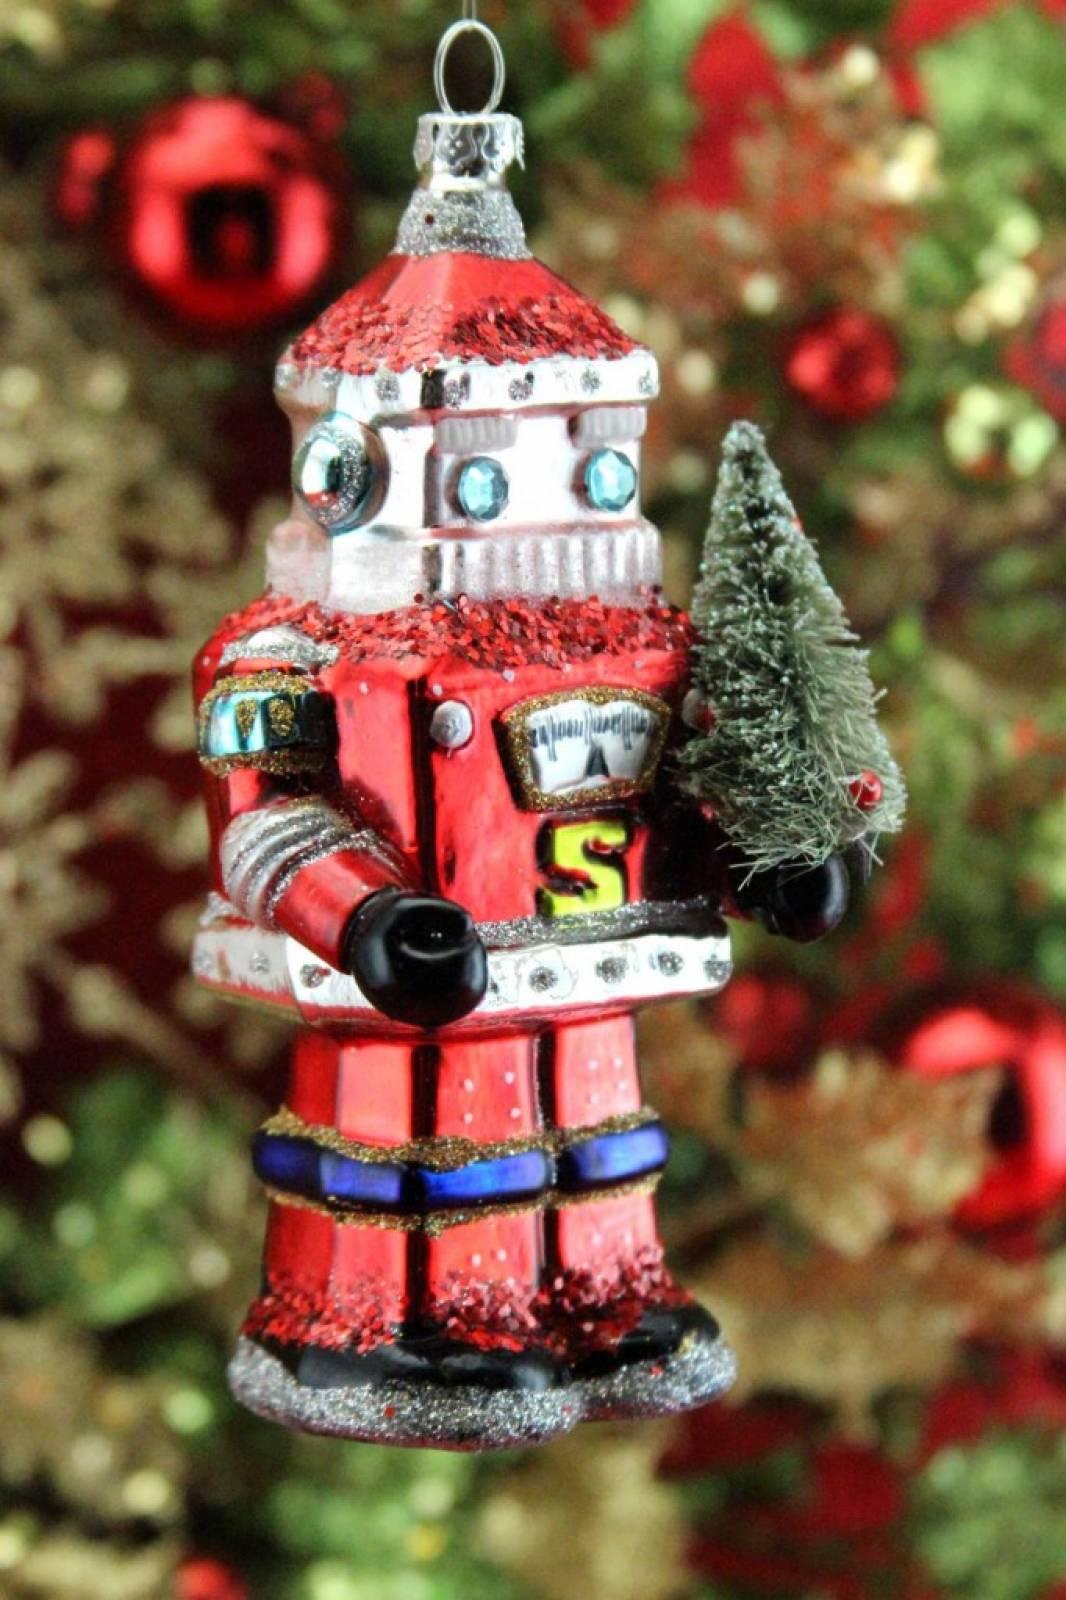 Glass Santa Robot Christmas Decoration By Gisela Graham thumbnails